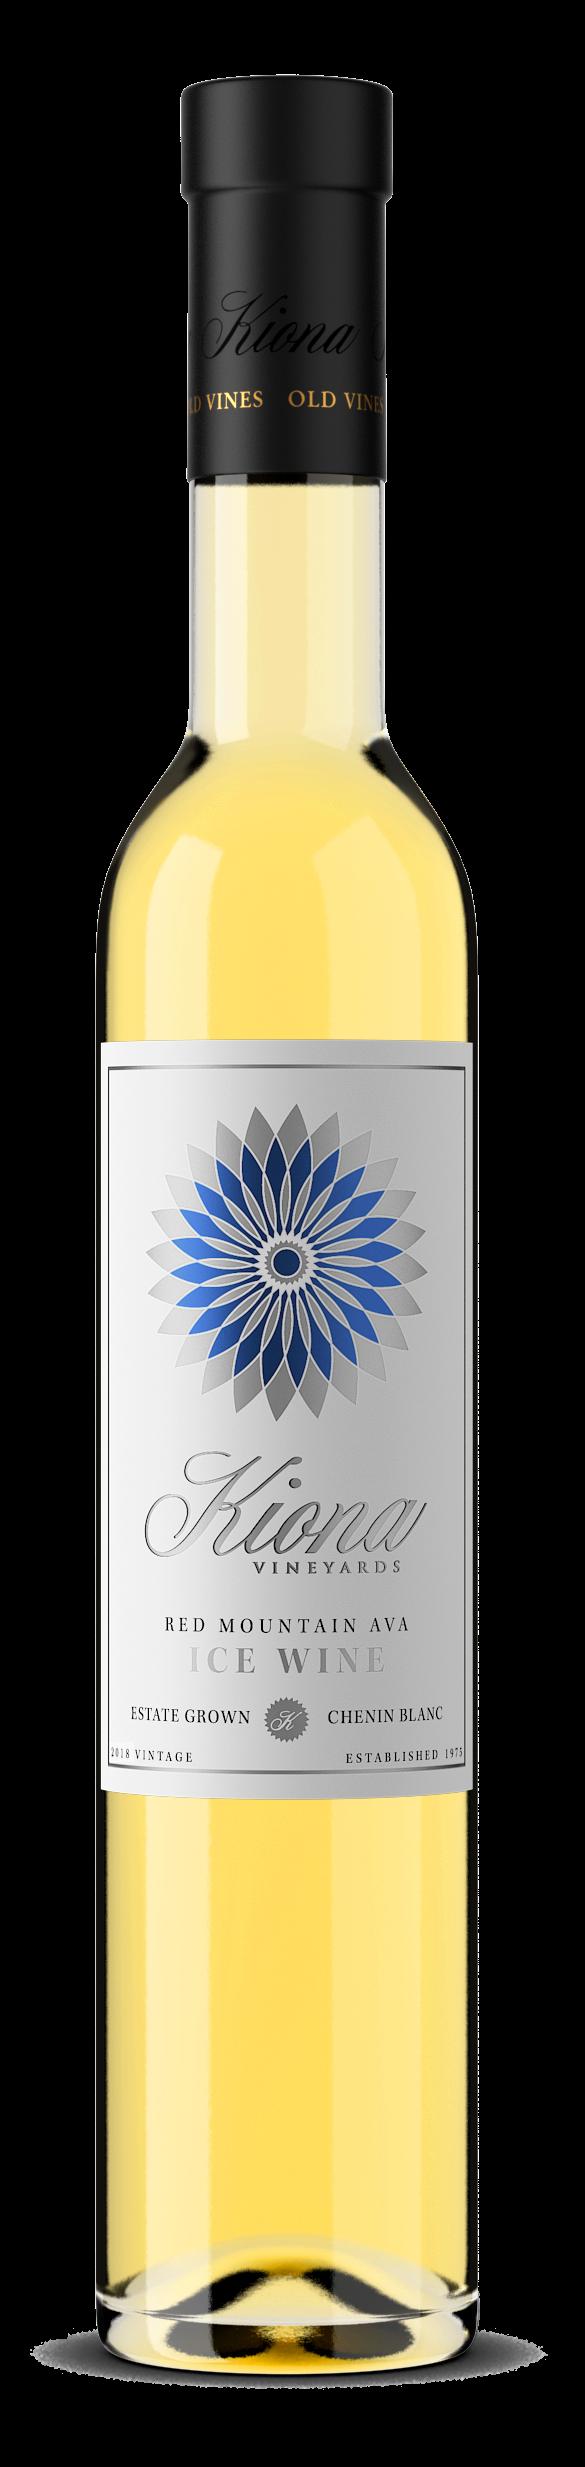 Kiona Red Mountain Ice Wine